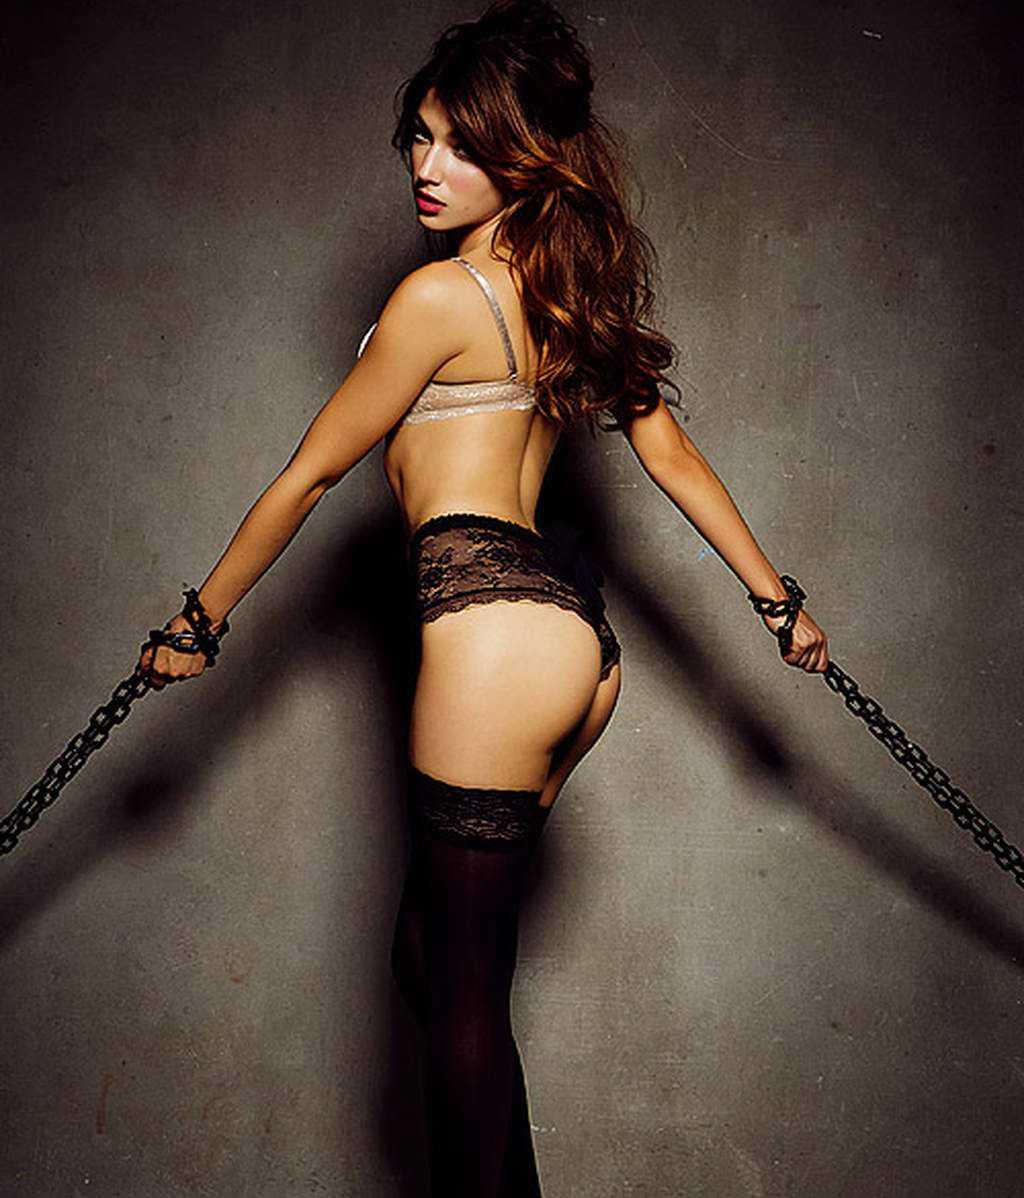 Úrsula Corberó sexy butt pics